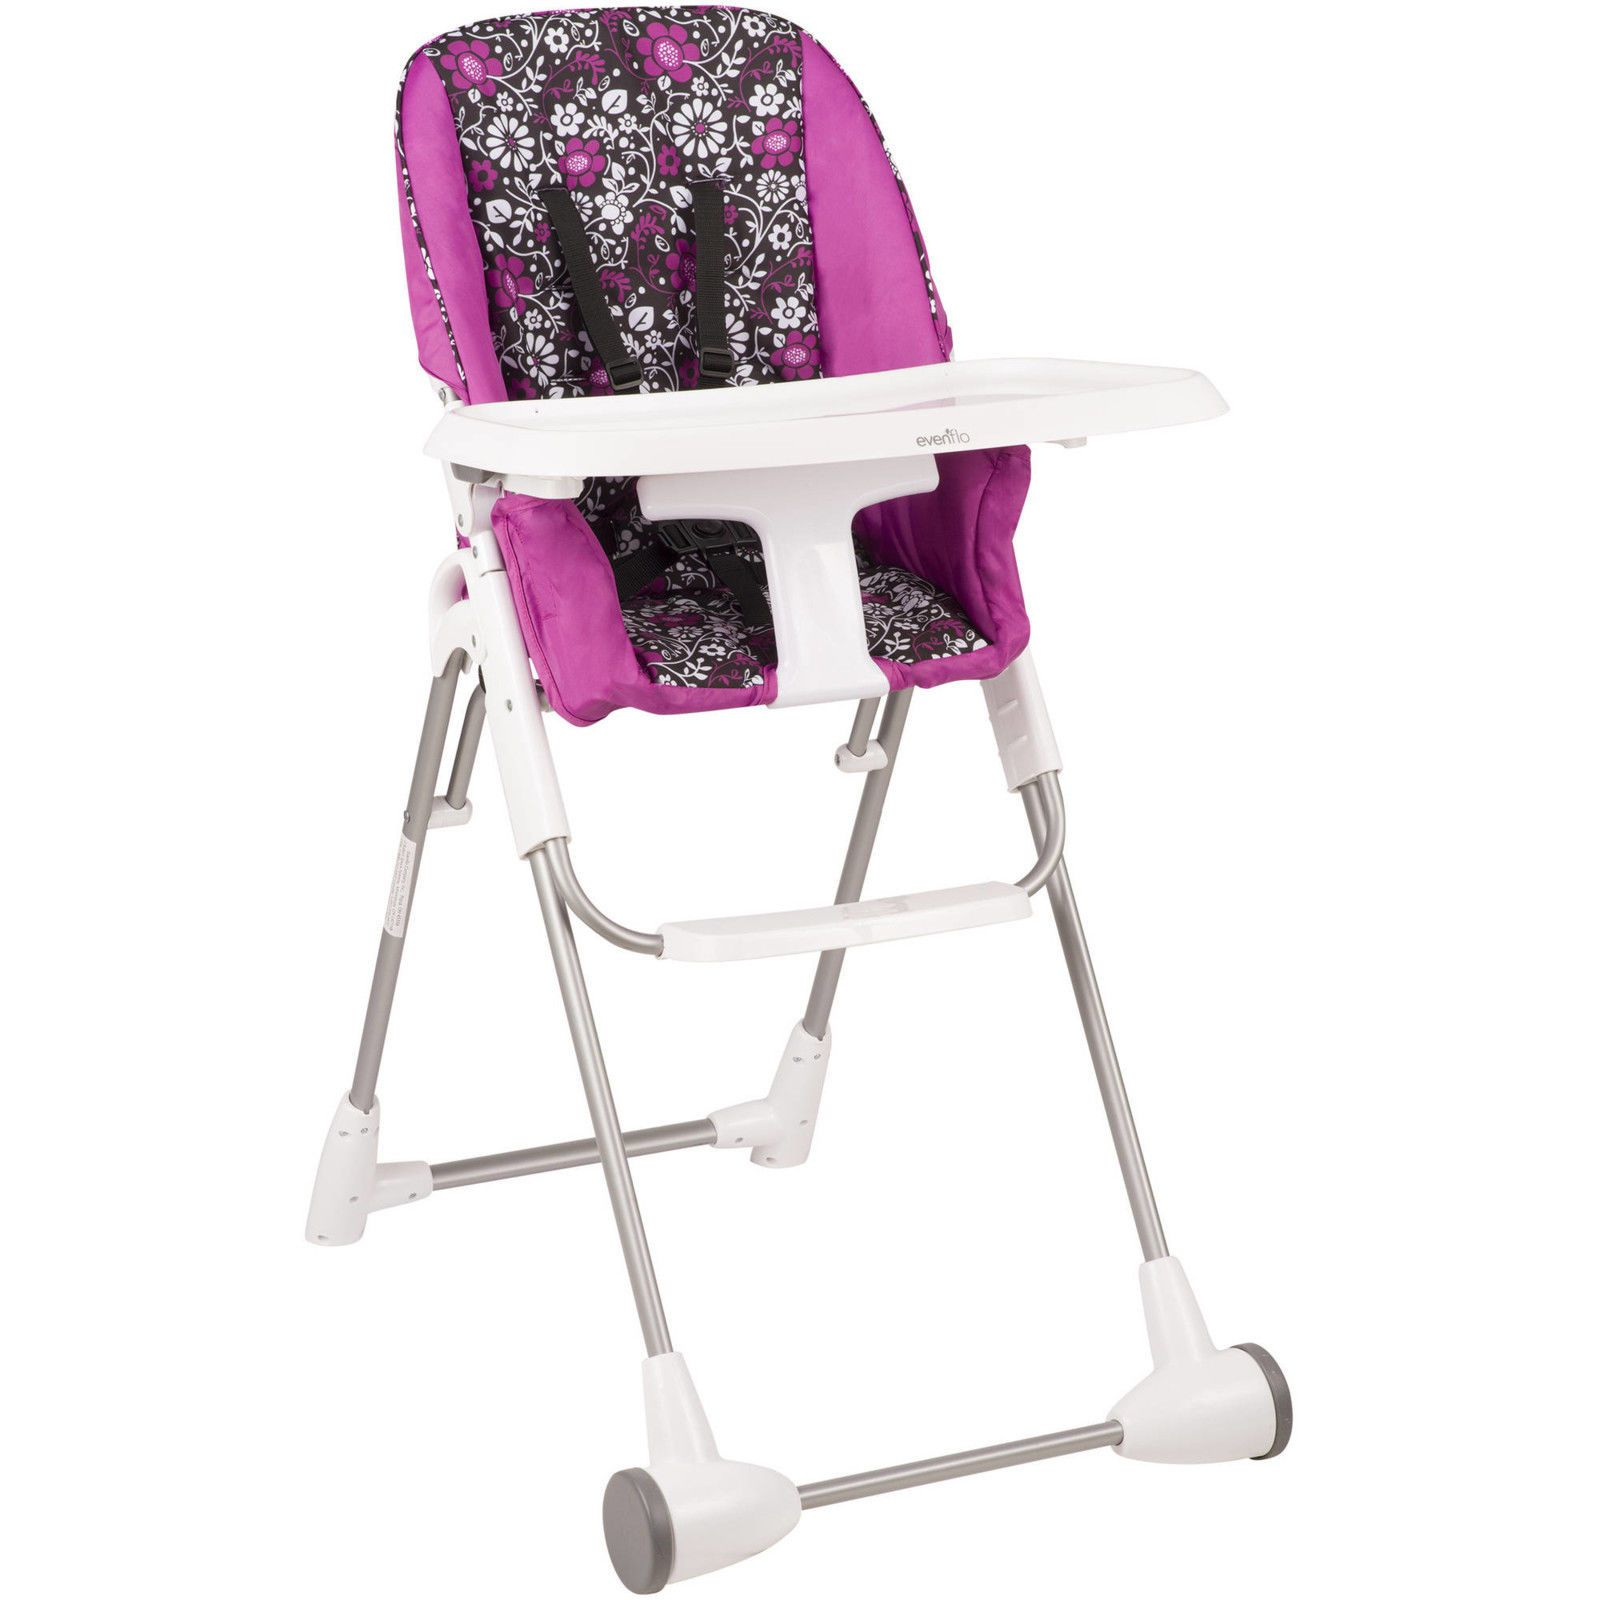 New Infant Toddler Portable Symmetry Flat Fold Feeding High Chair Daphne Folding High Chair High Chair Big Comfy Chair